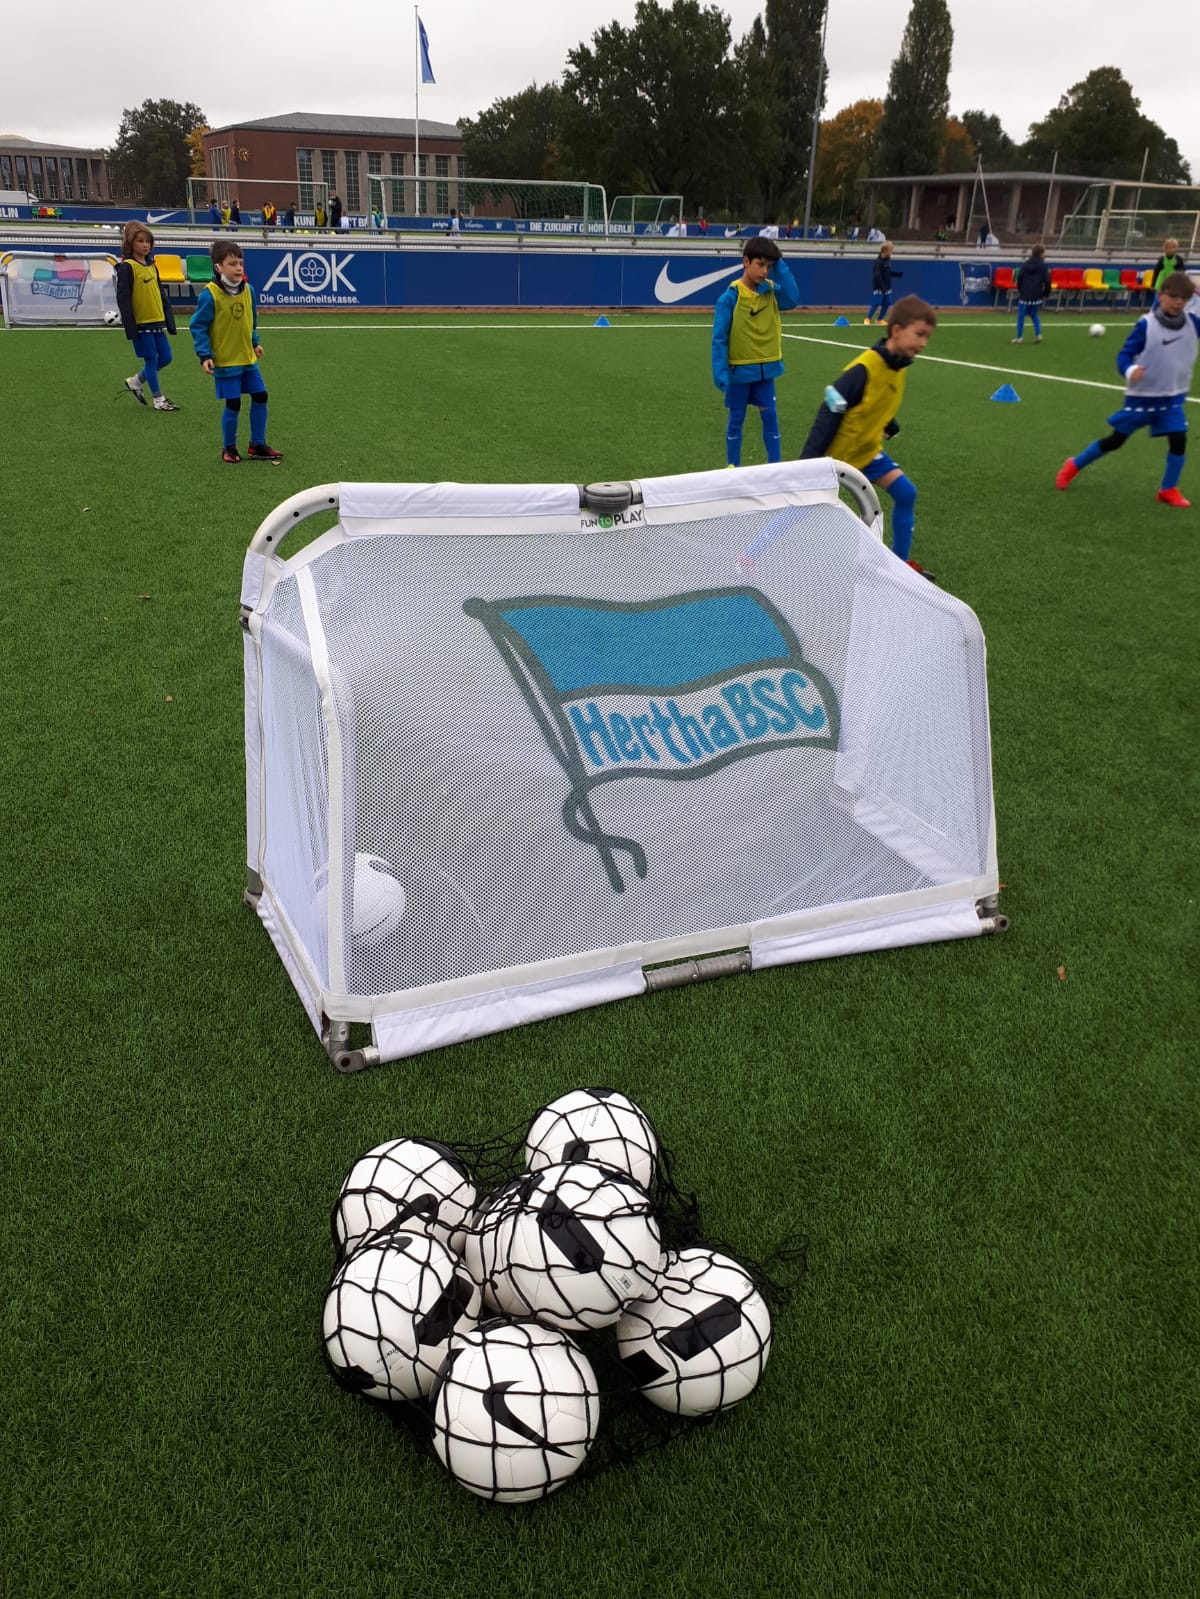 Ein Hertha BSC-Trainingstor auf dem Trainingsplatz.